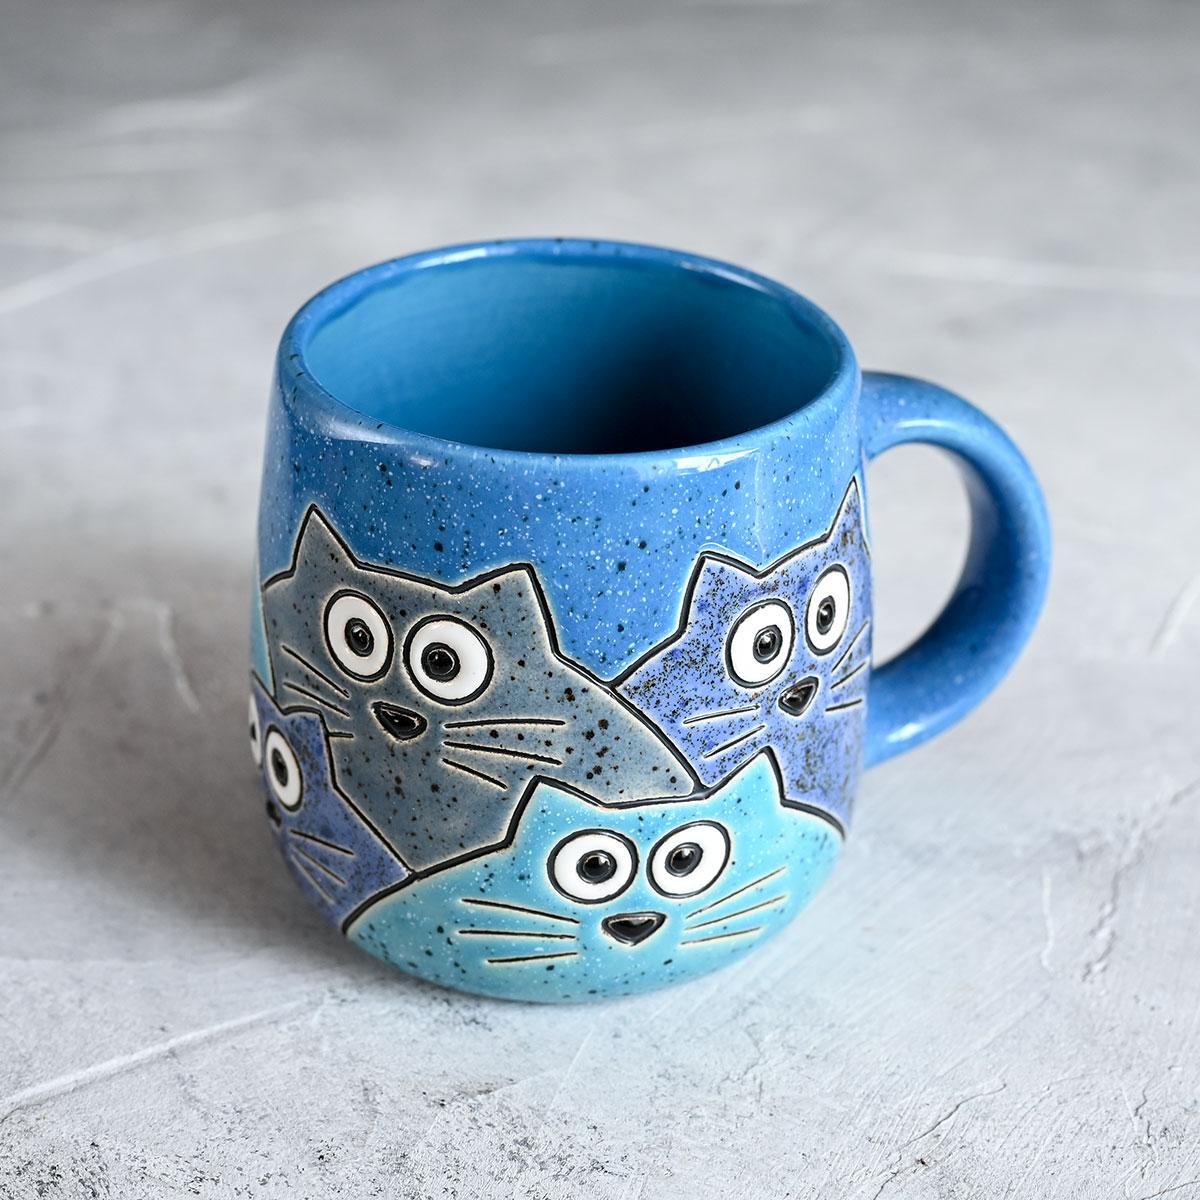 "картинка Кружка ""Котики"" большая синяя 450 мл - DishWishes.Ru"